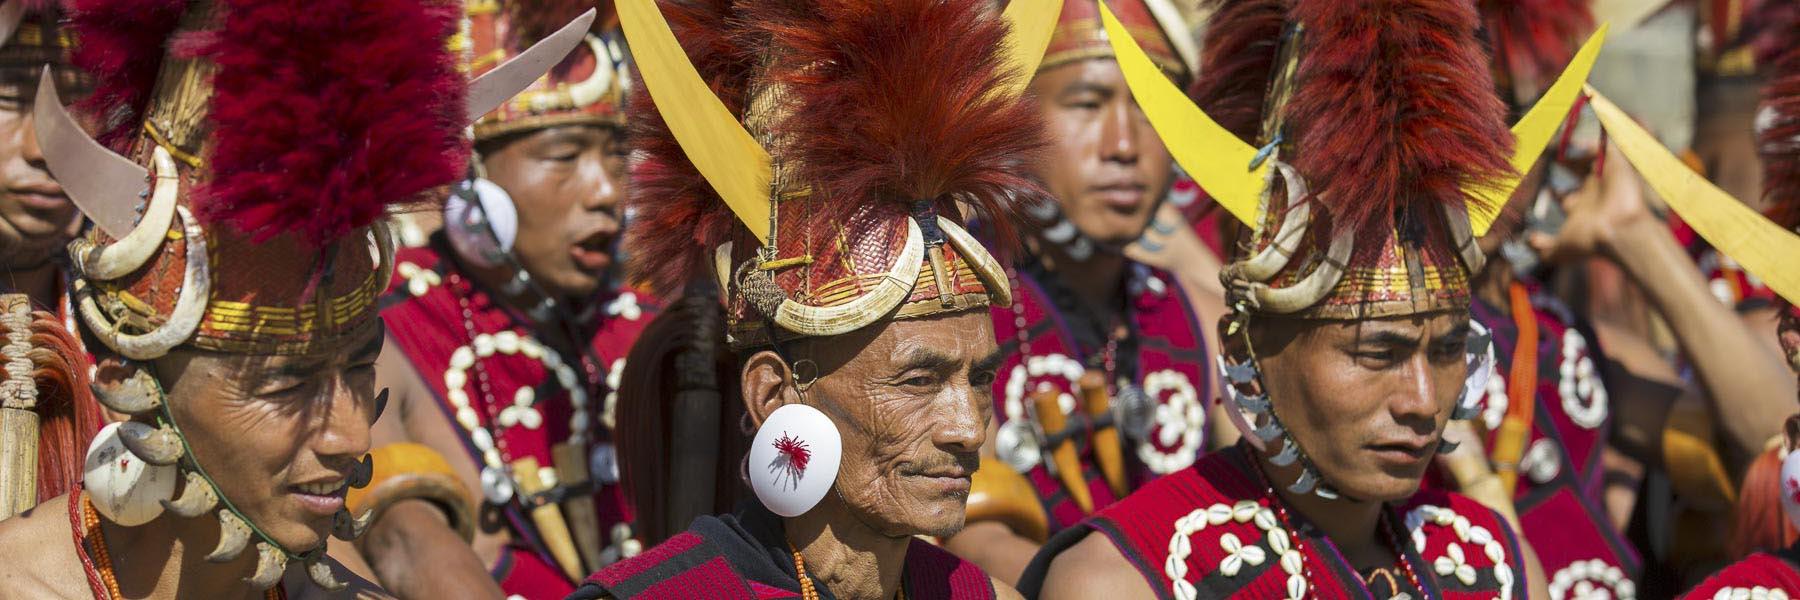 Meet the aboriginal tribes